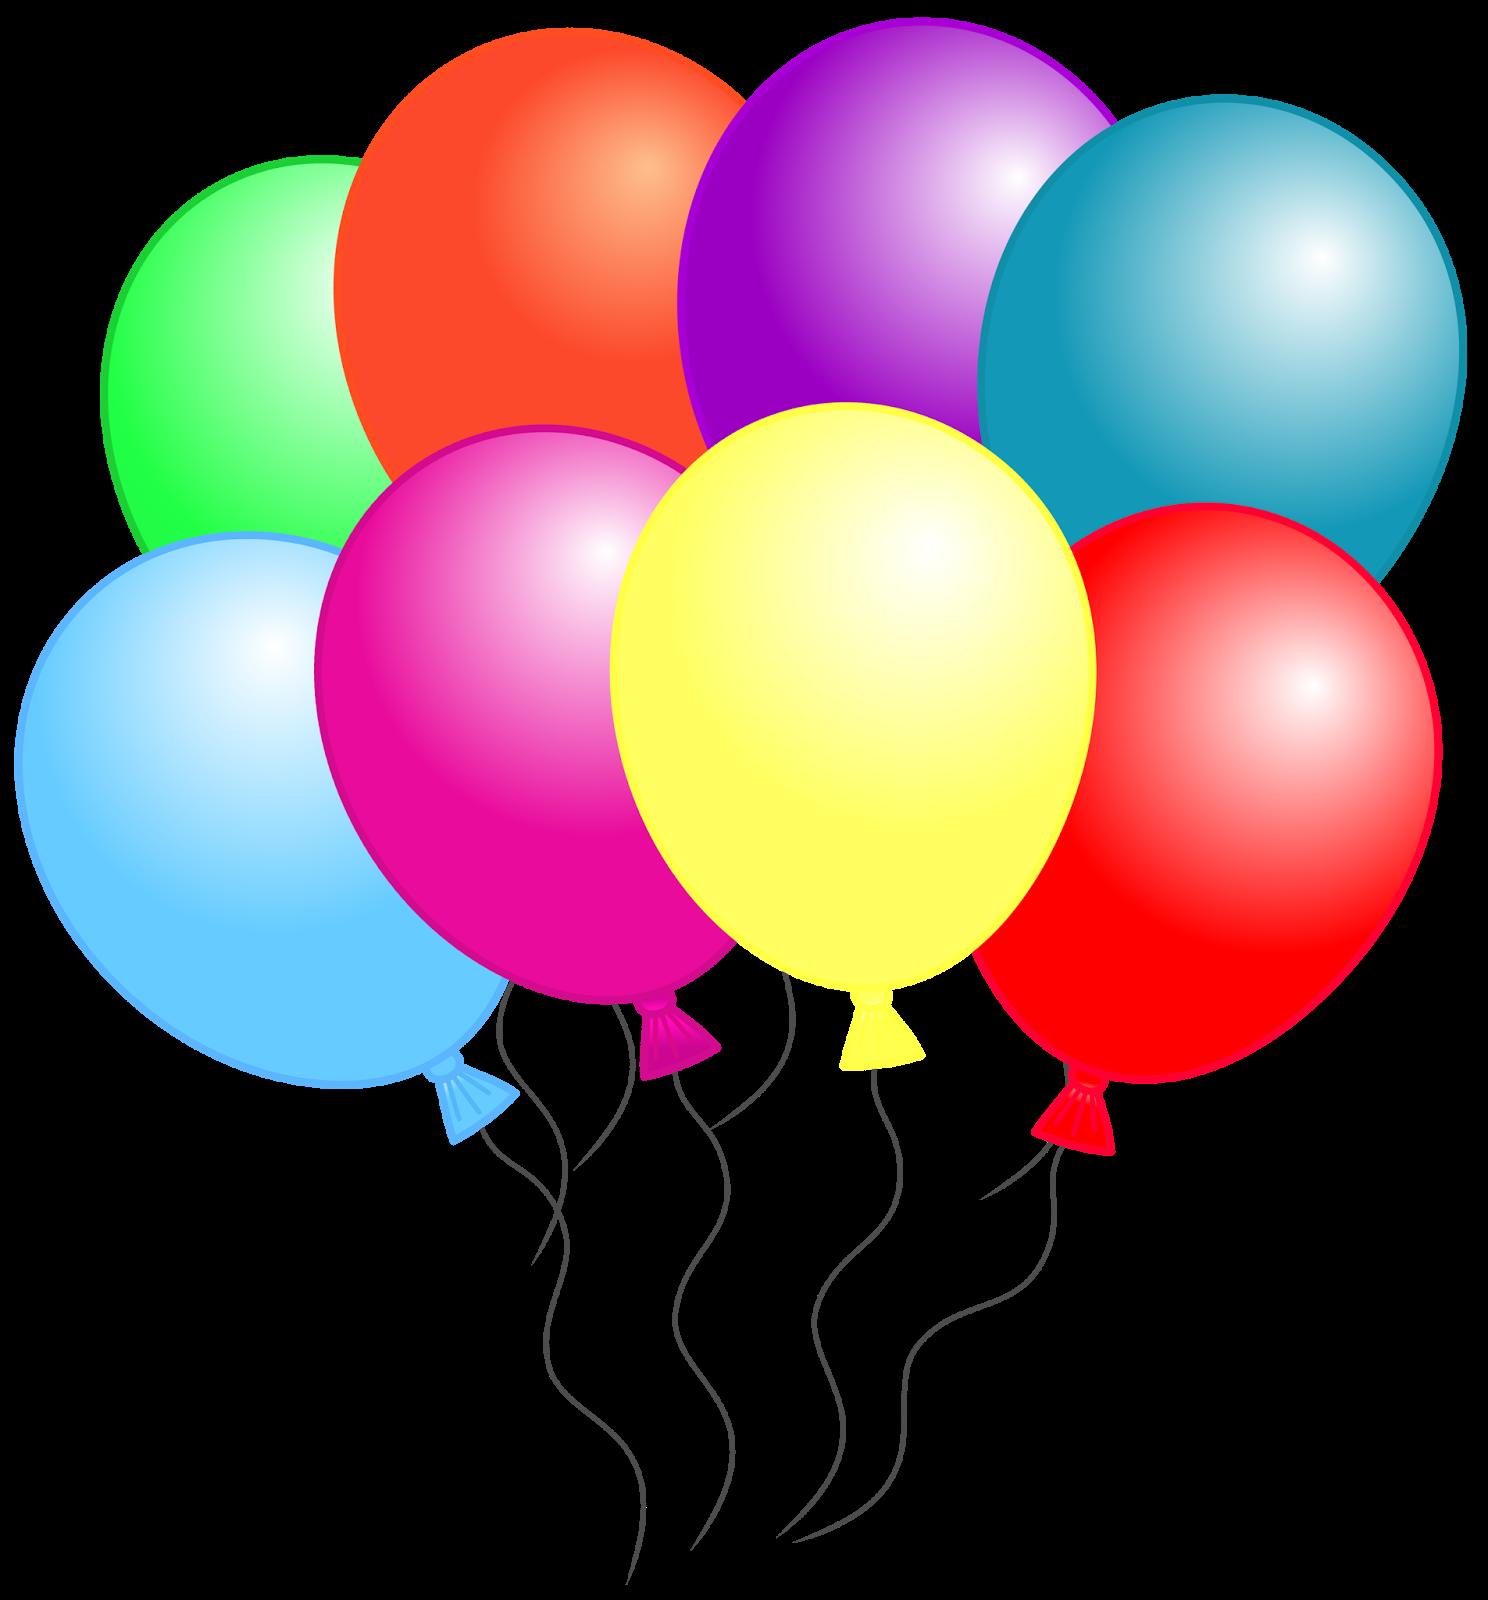 Poinsettia clipart balloon Balloon PNG that  can